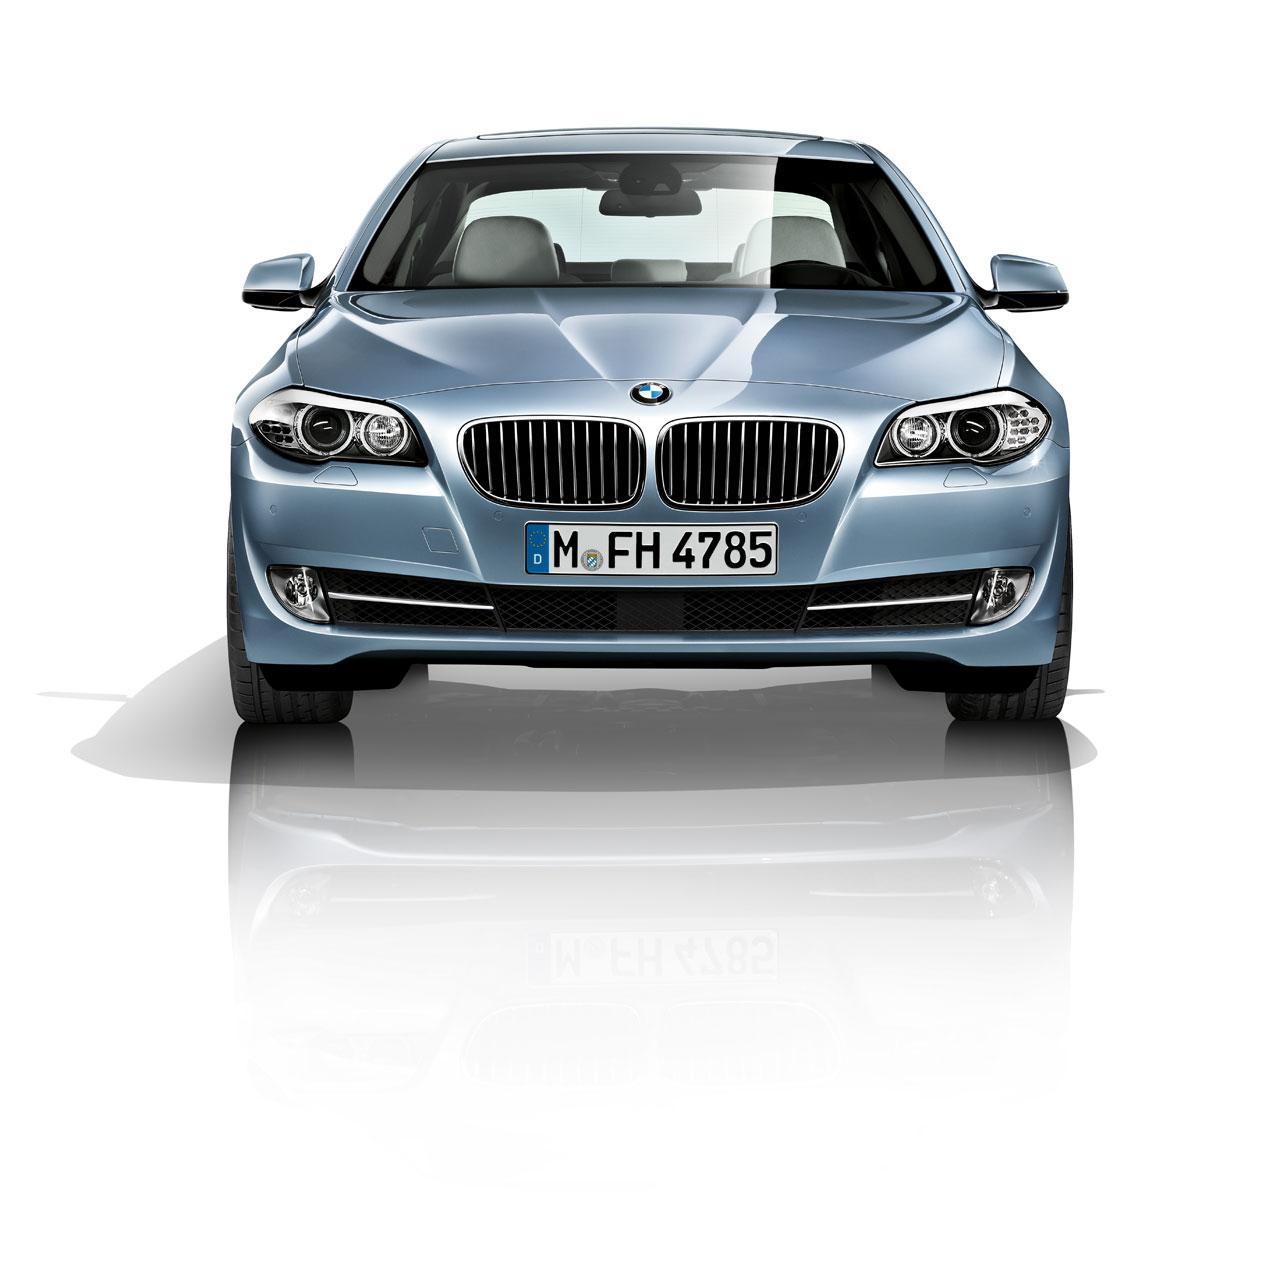 2012 BMW ActiveHybrid 5 Photo Gallery - Autoblog